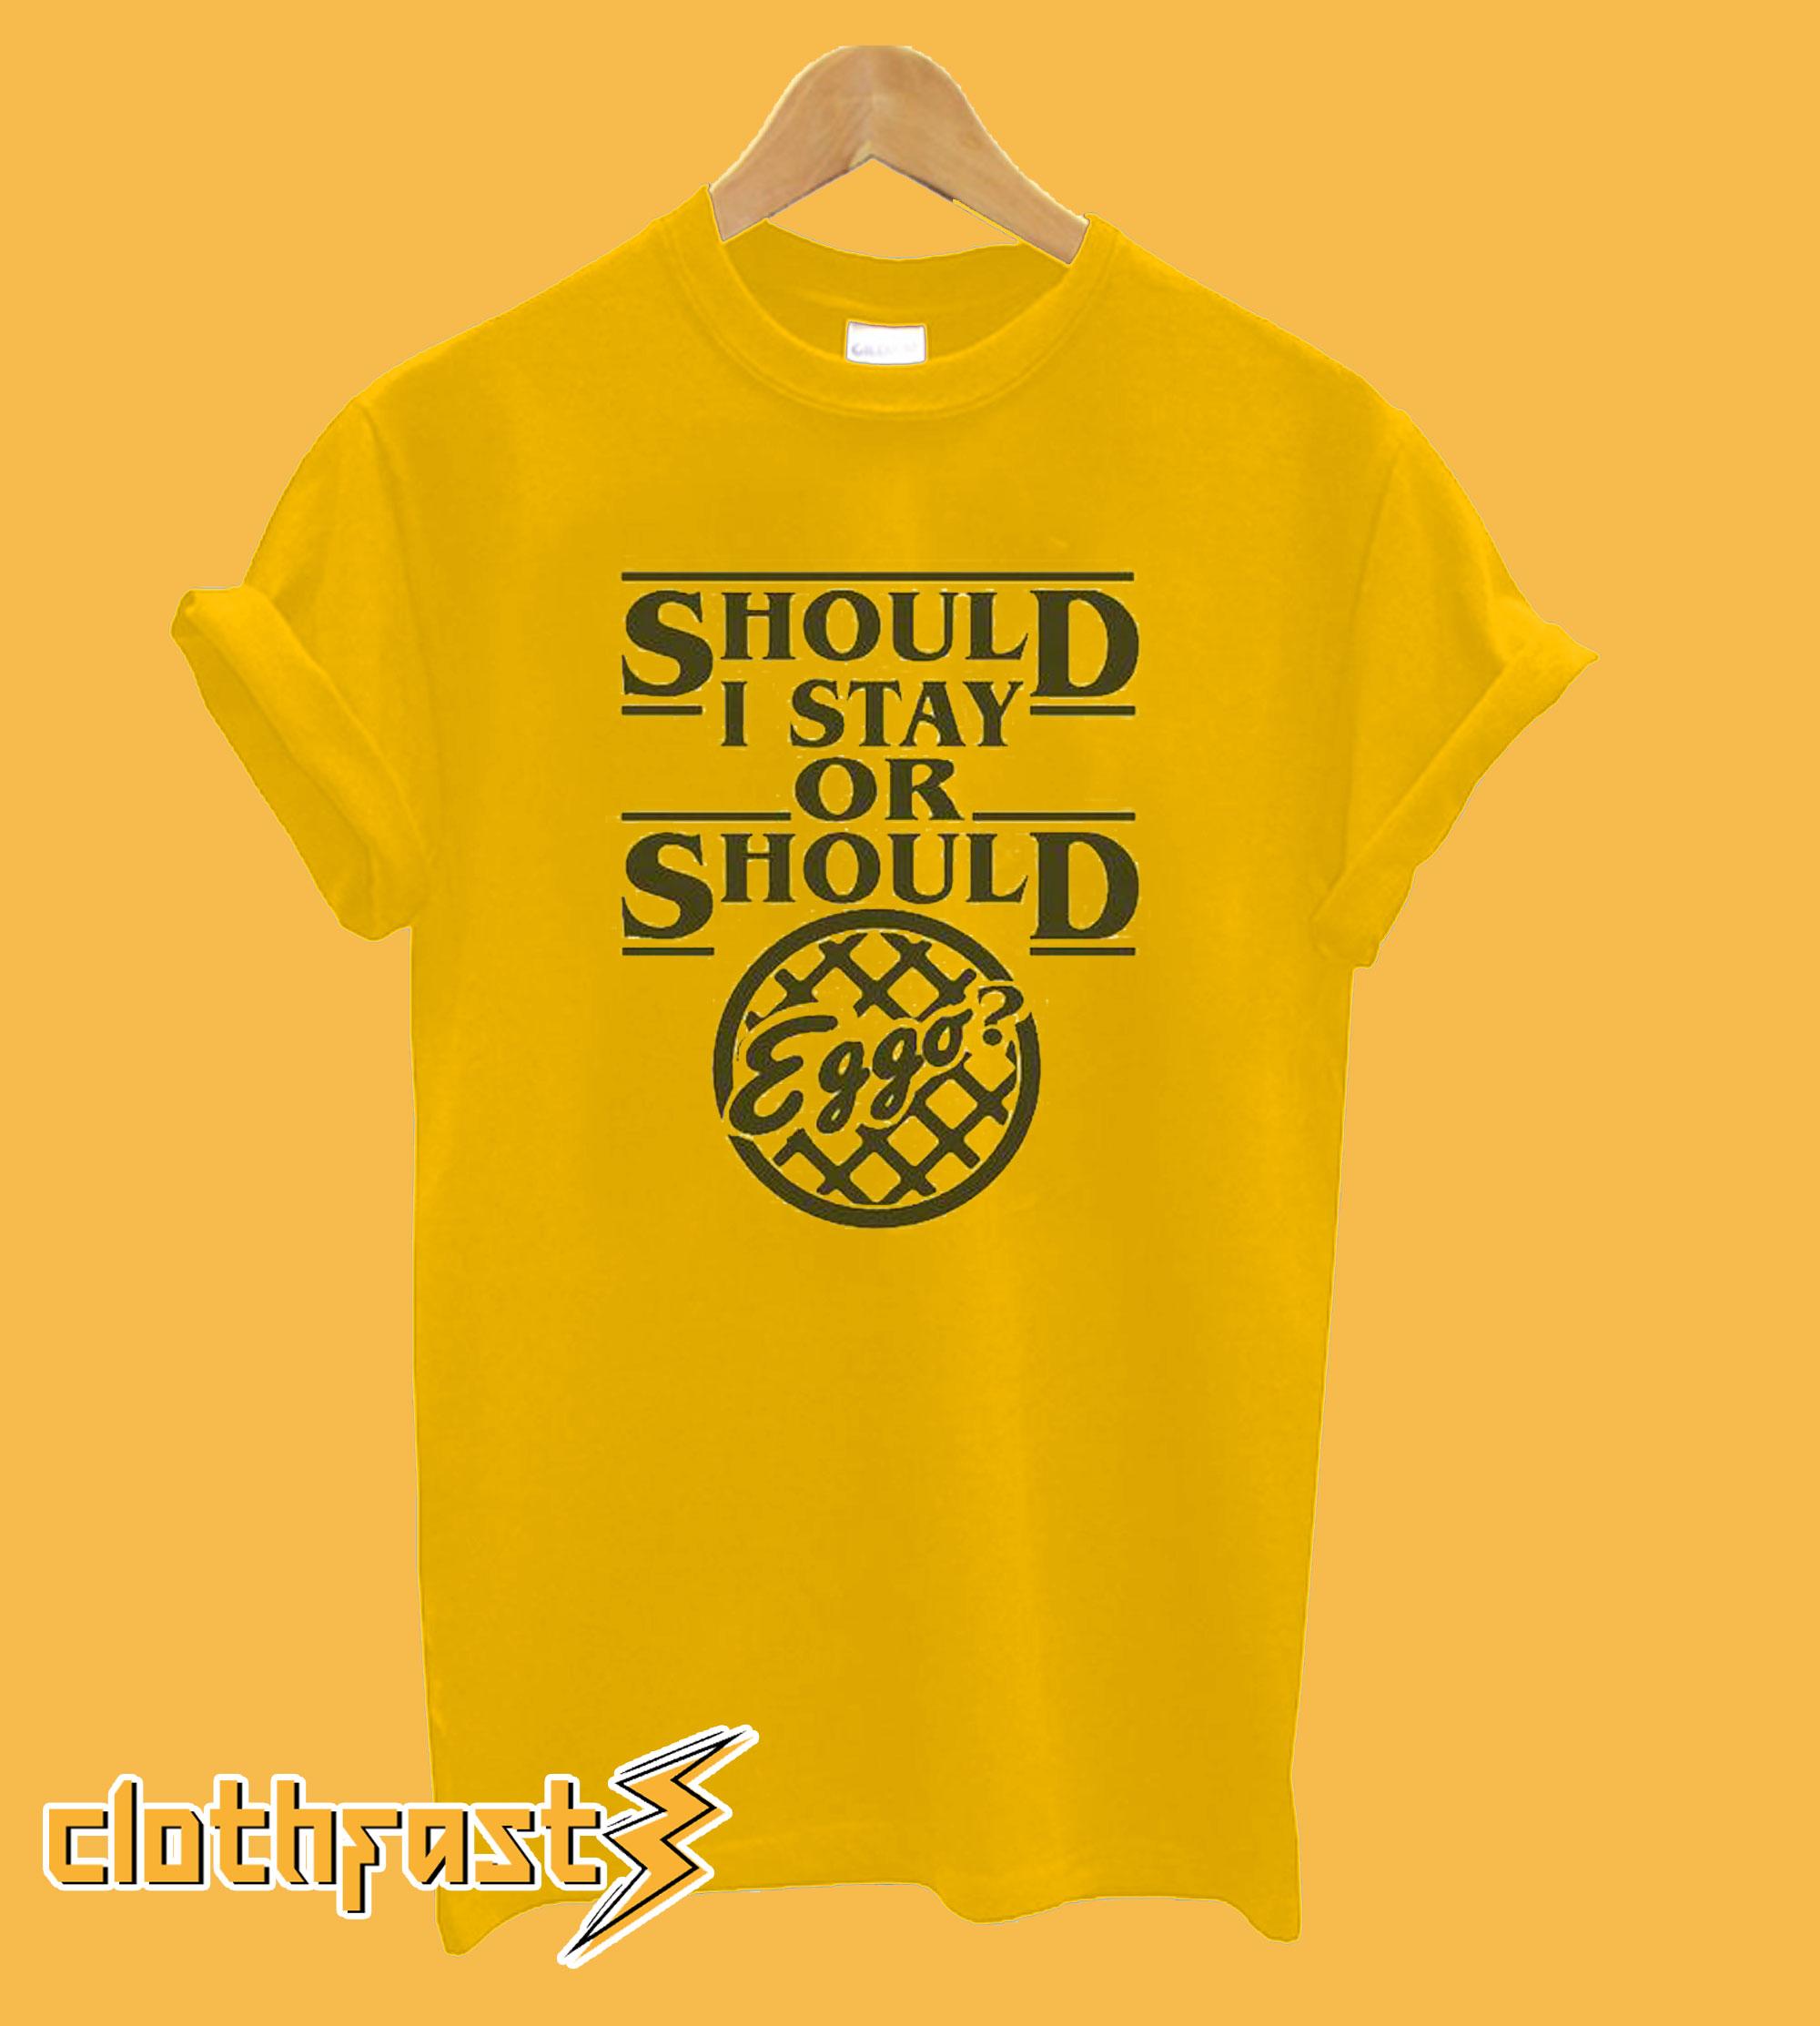 Should I Stay Or Should I Eggo T-Shirt